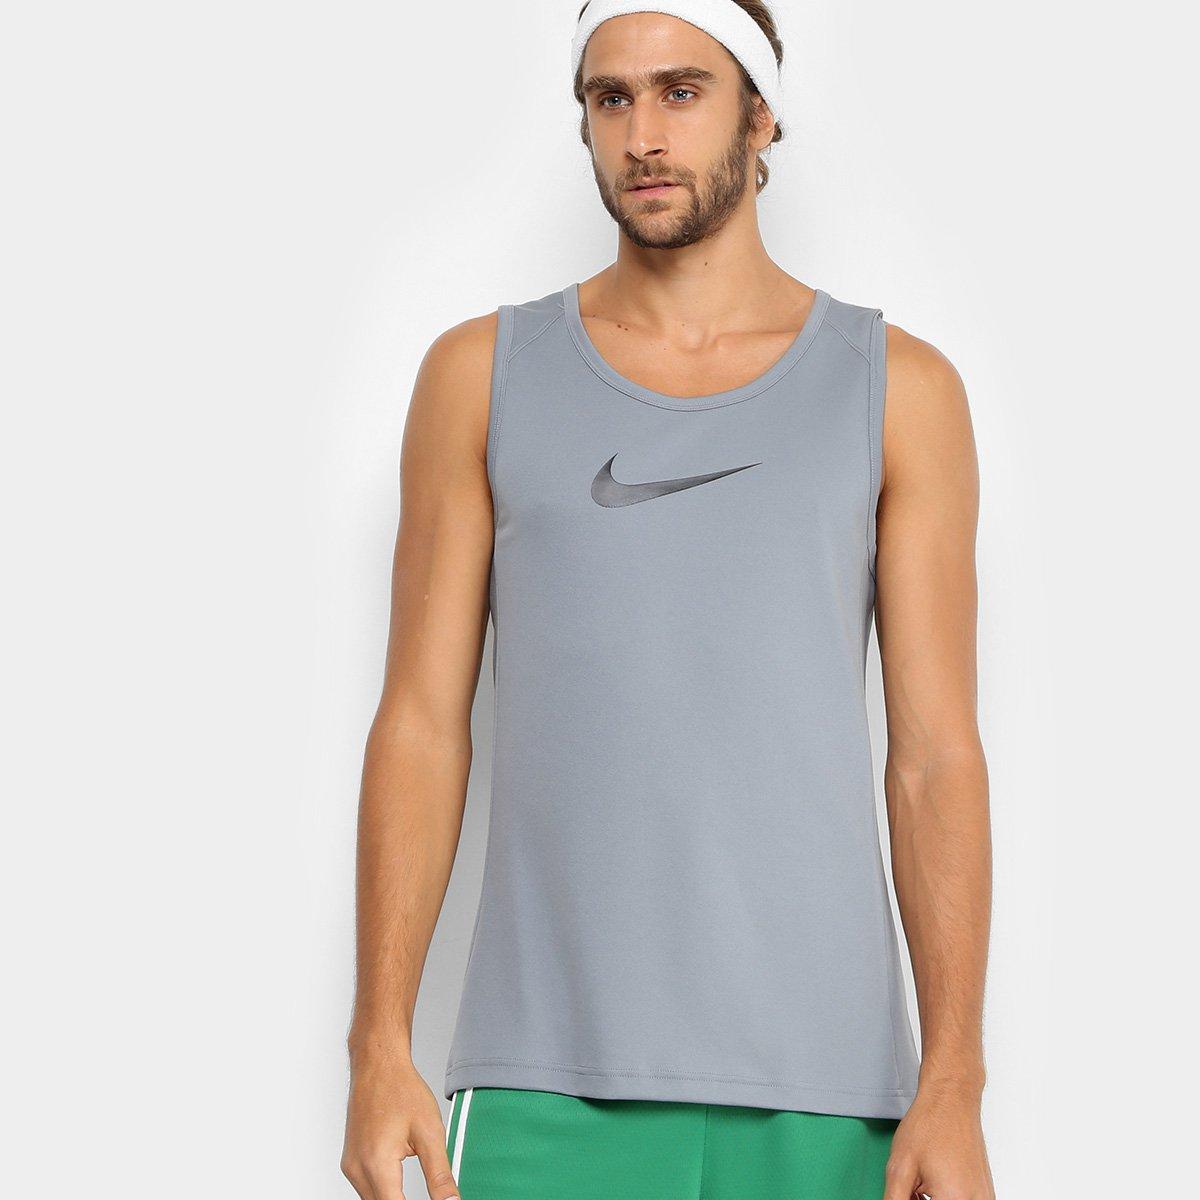 Regata Nike Dry Crossover BB Masculina - Compre Agora  ae884b1acca